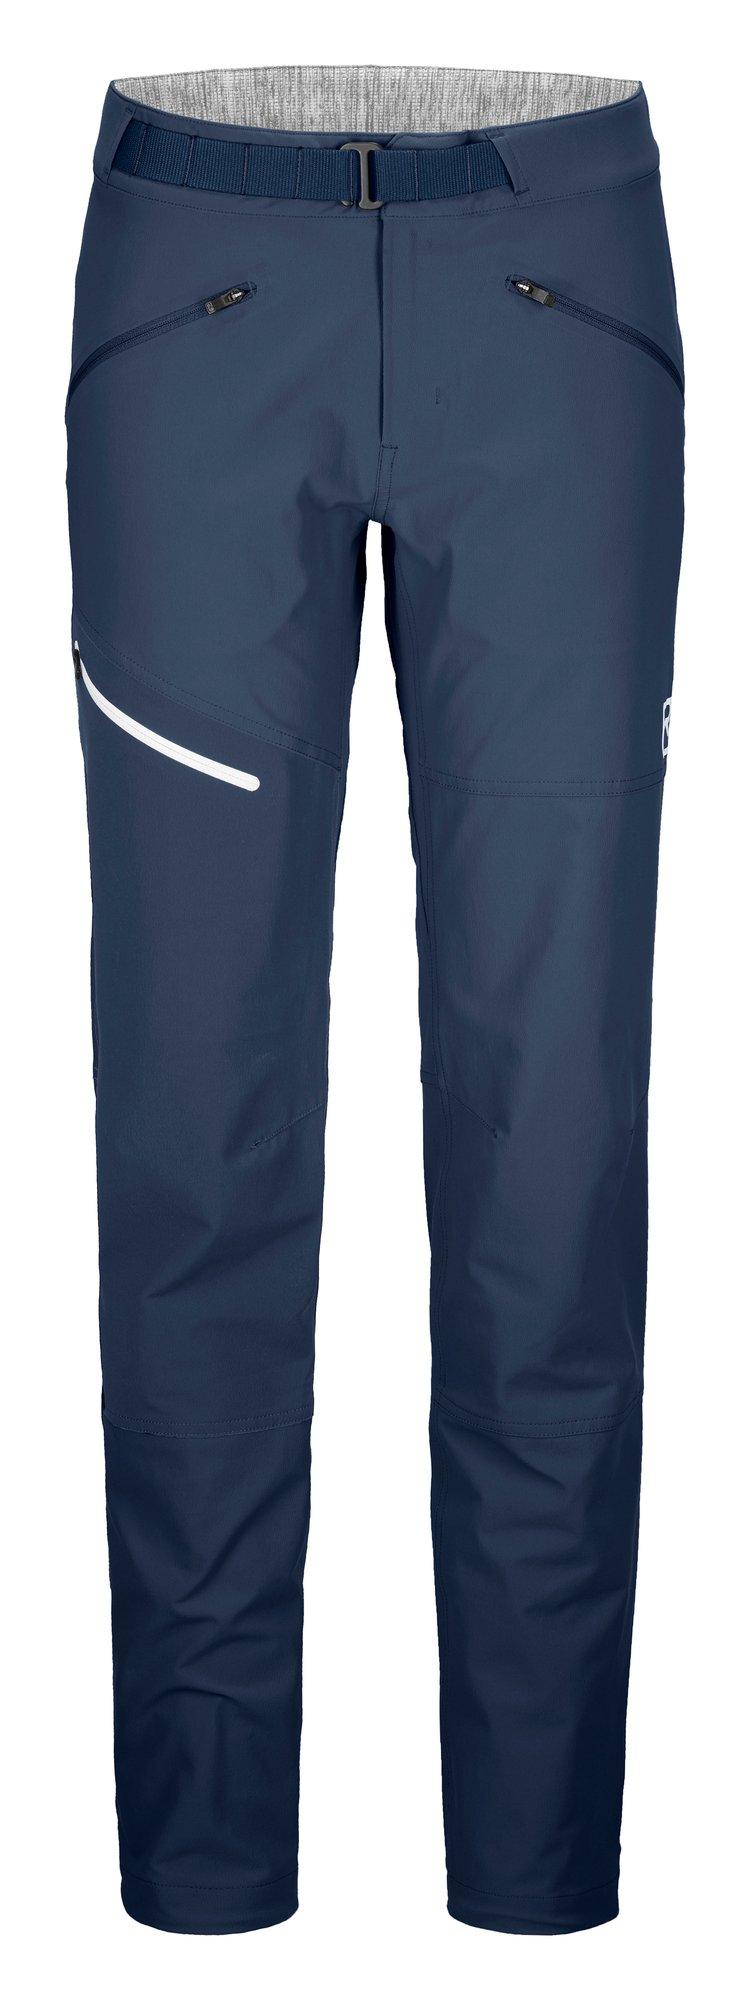 "Ortovox ""Brenta Pants W"" - blue lake"